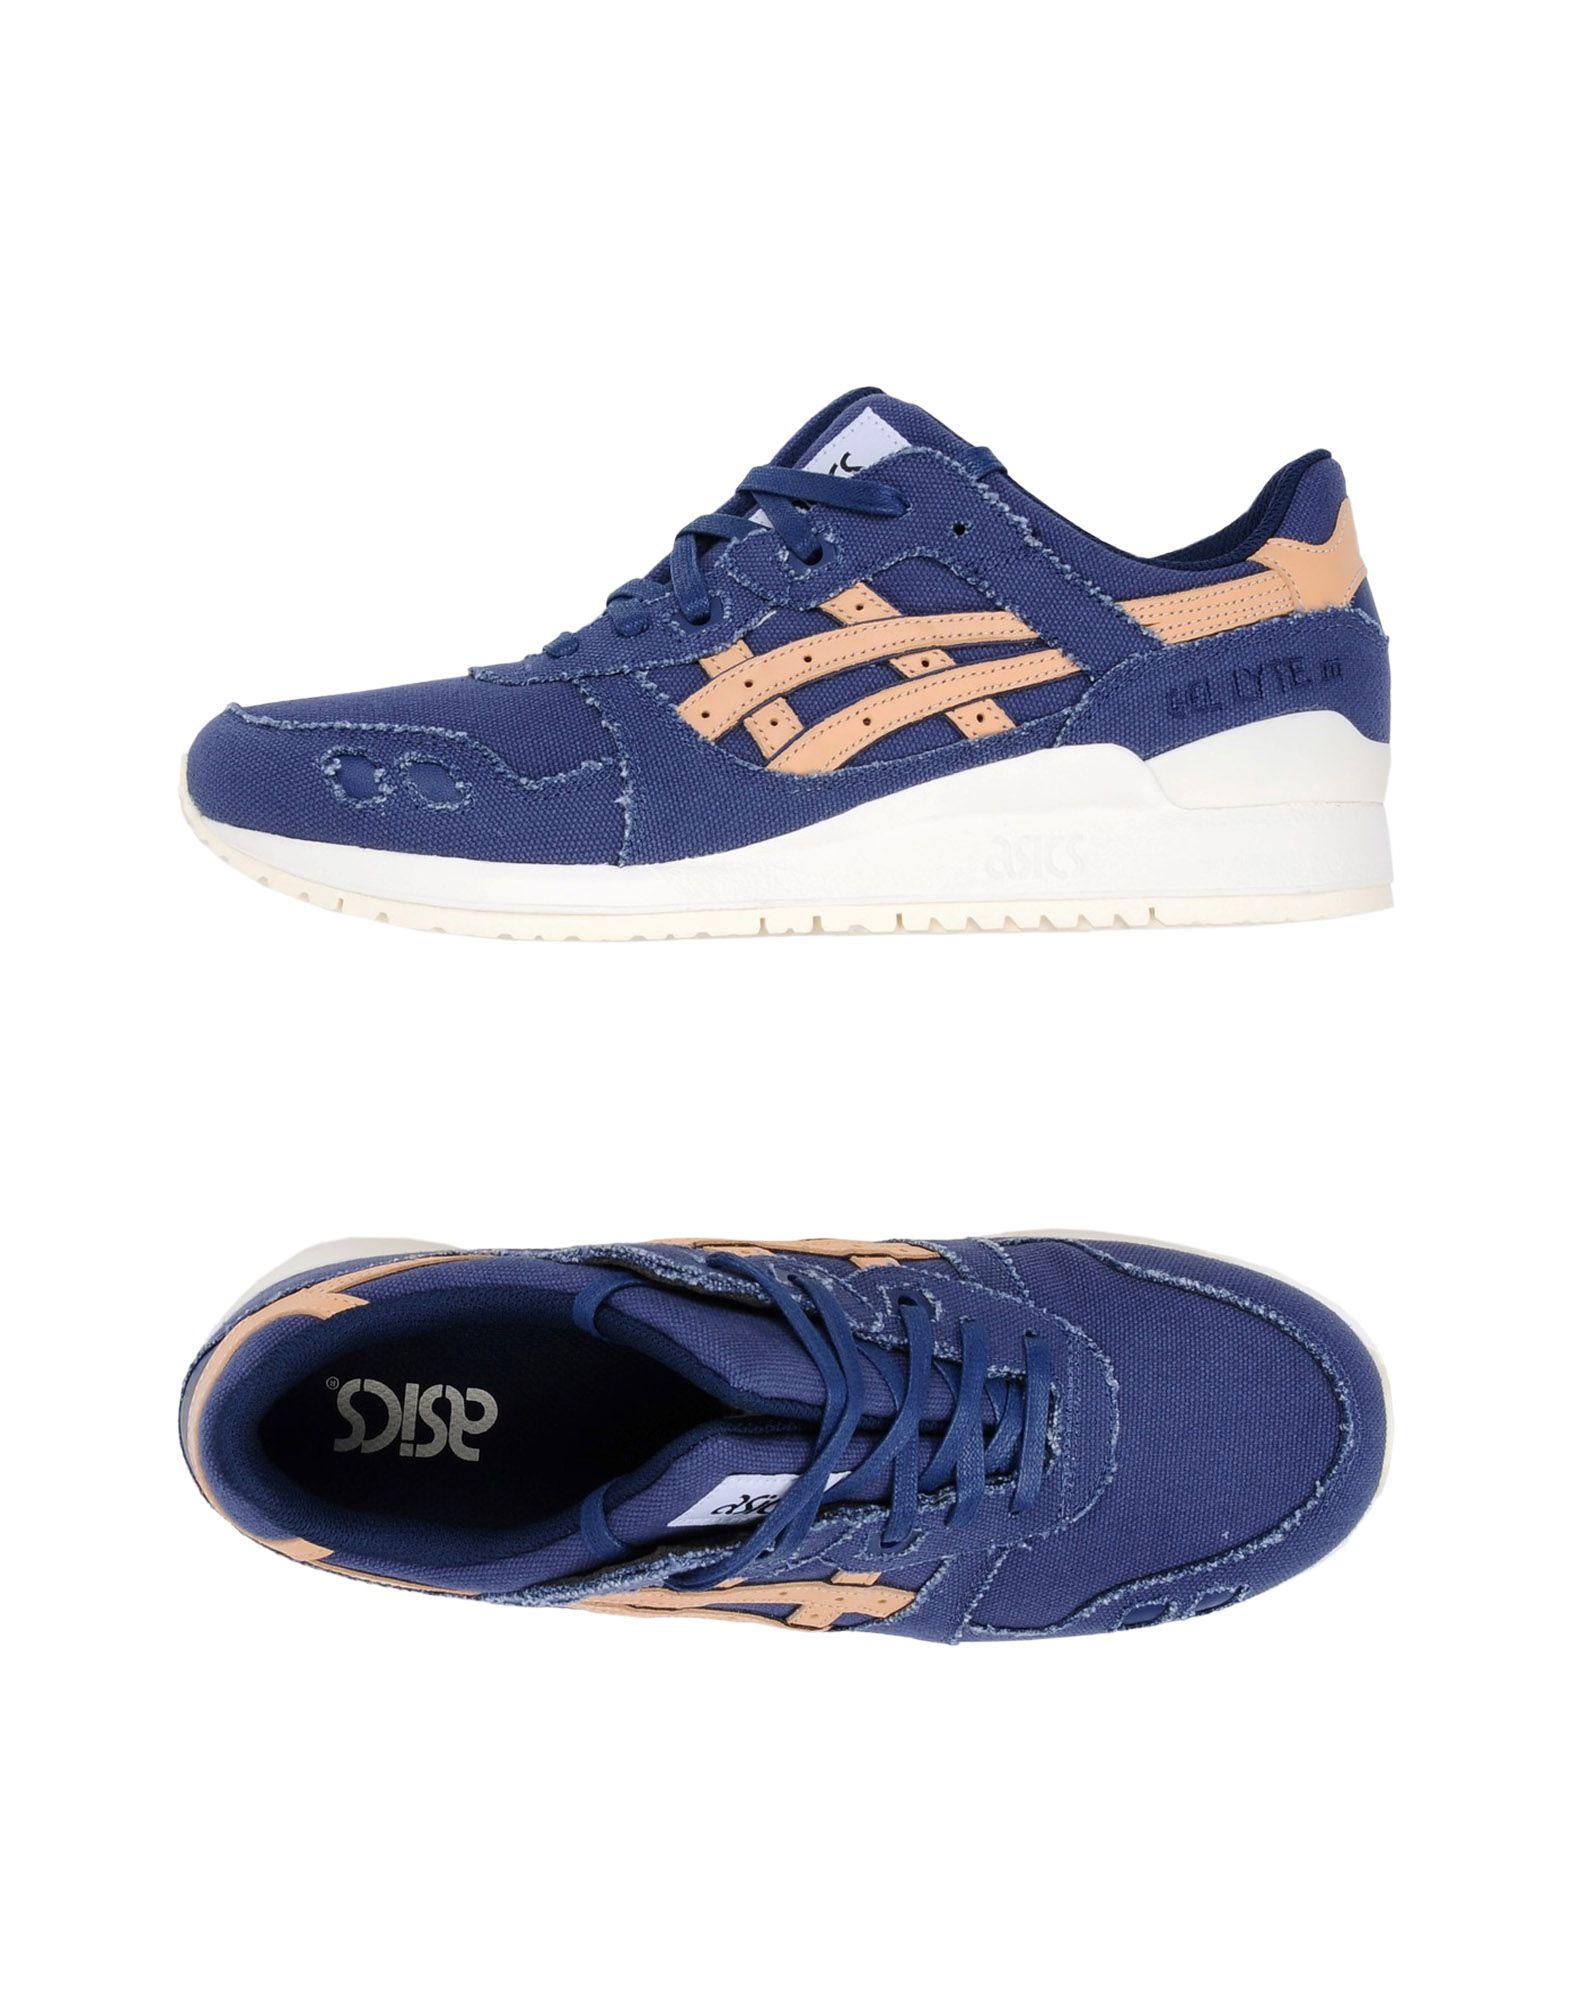 Sneakers Asics Tiger Lyte 3 - Uomo - 11269095SL